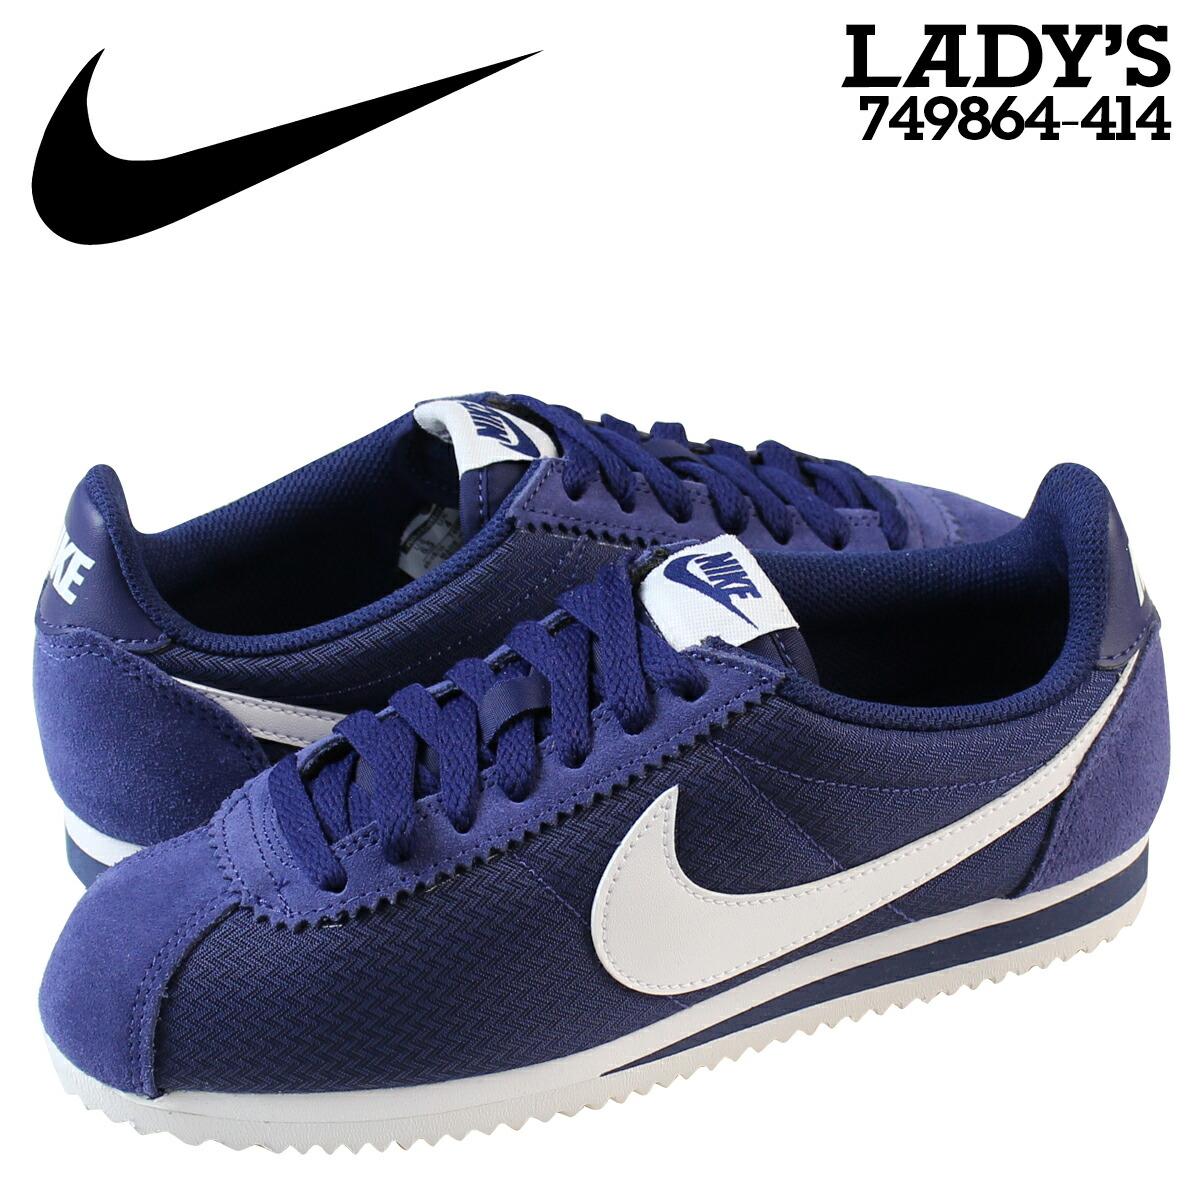 Nike Cortez Blue Nylon